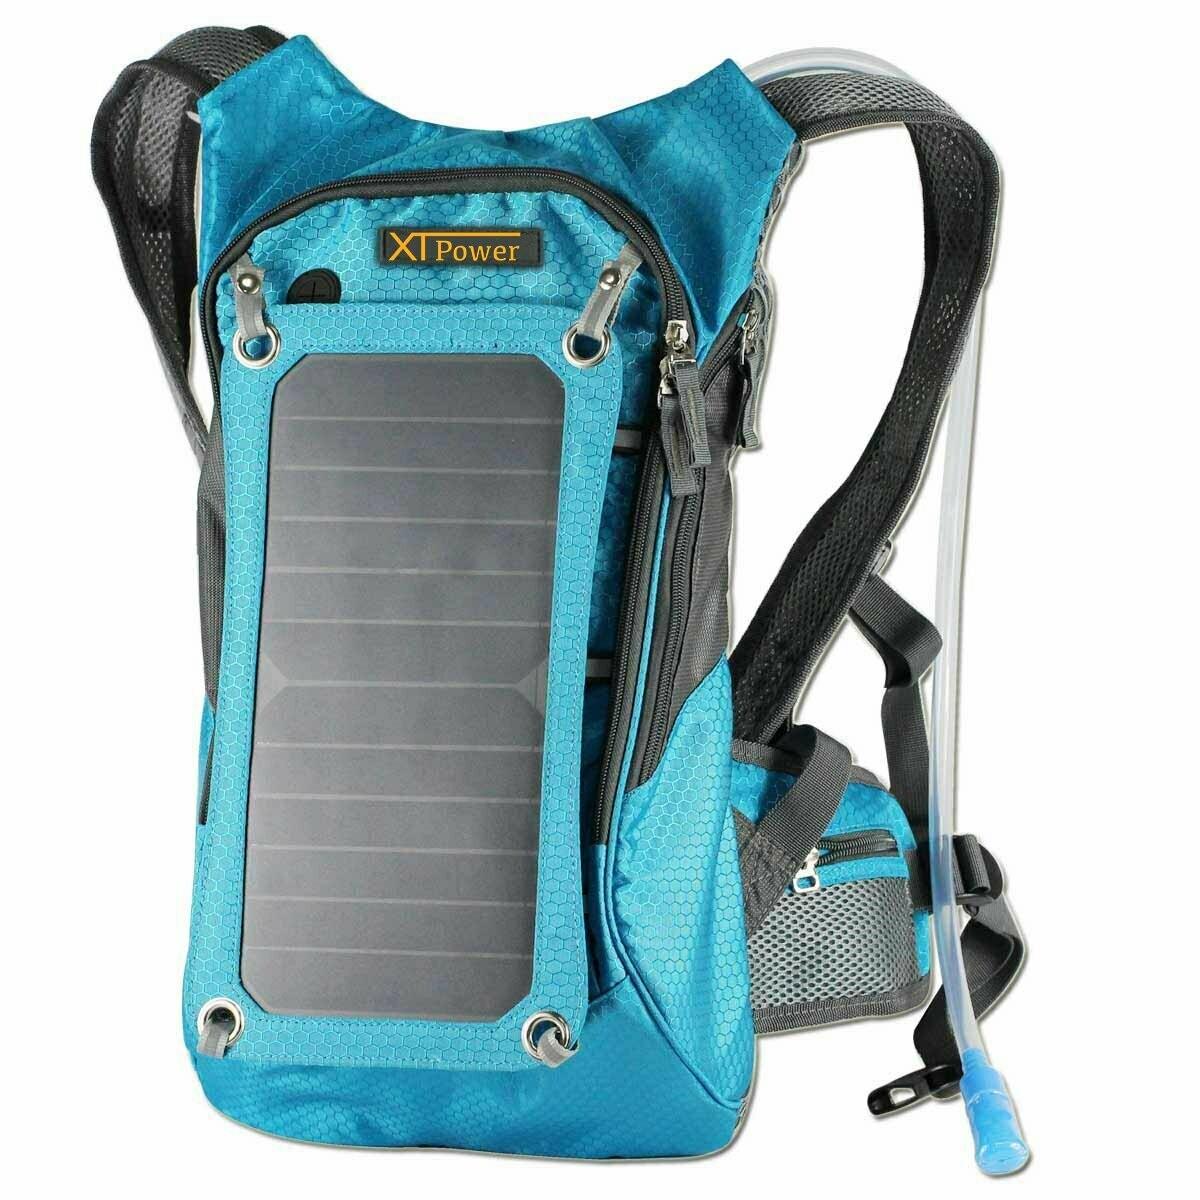 XTPower Xplorer Hiker 8 Turquoise Backpack with 7 Watt Removable Solar Panel